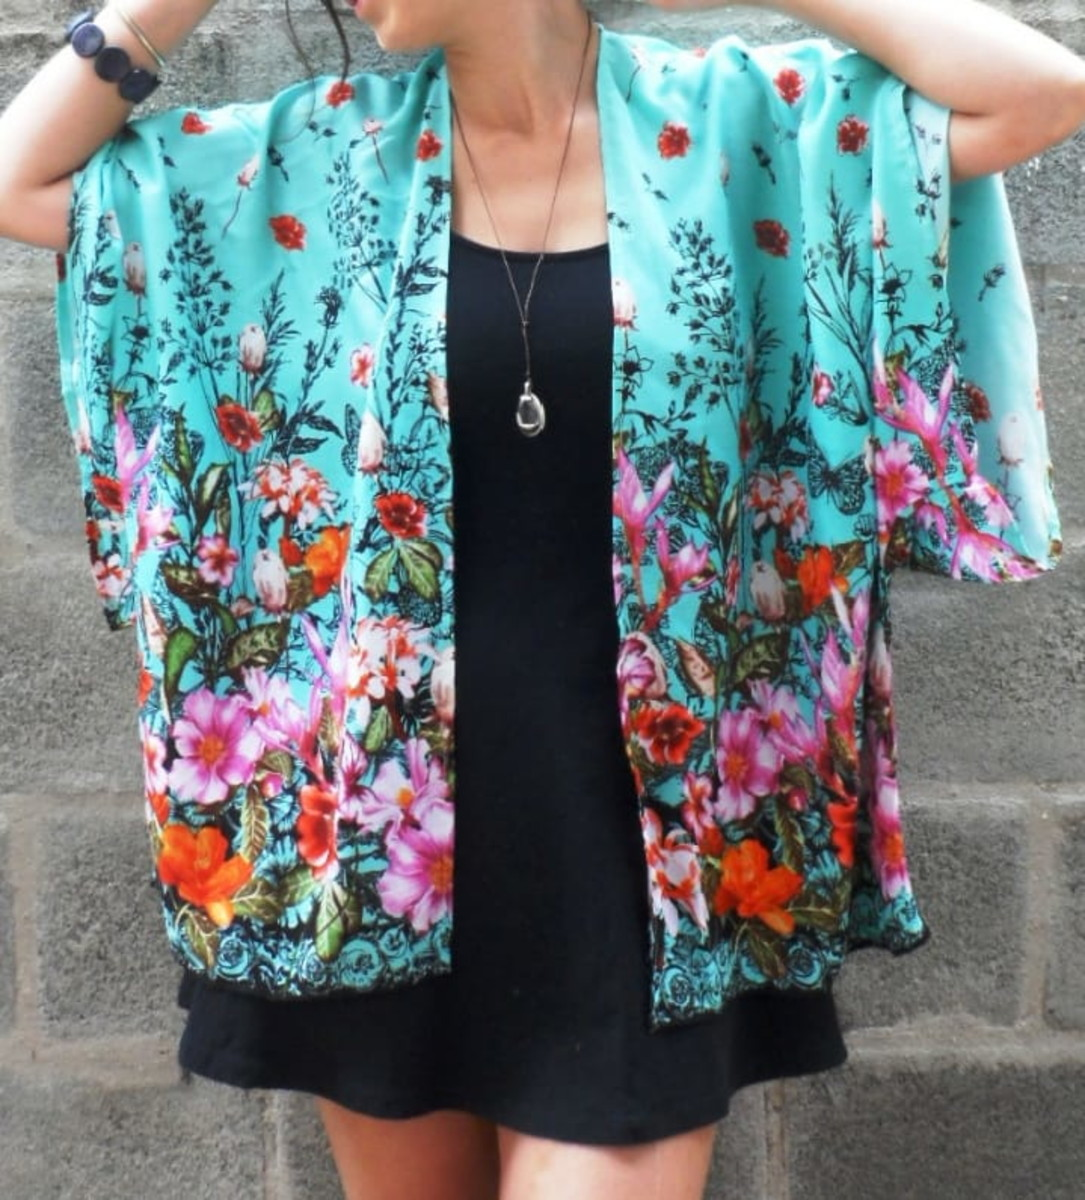 d67285ae8 Kimono Feminino Moda Floral Boho 2019 no Elo7